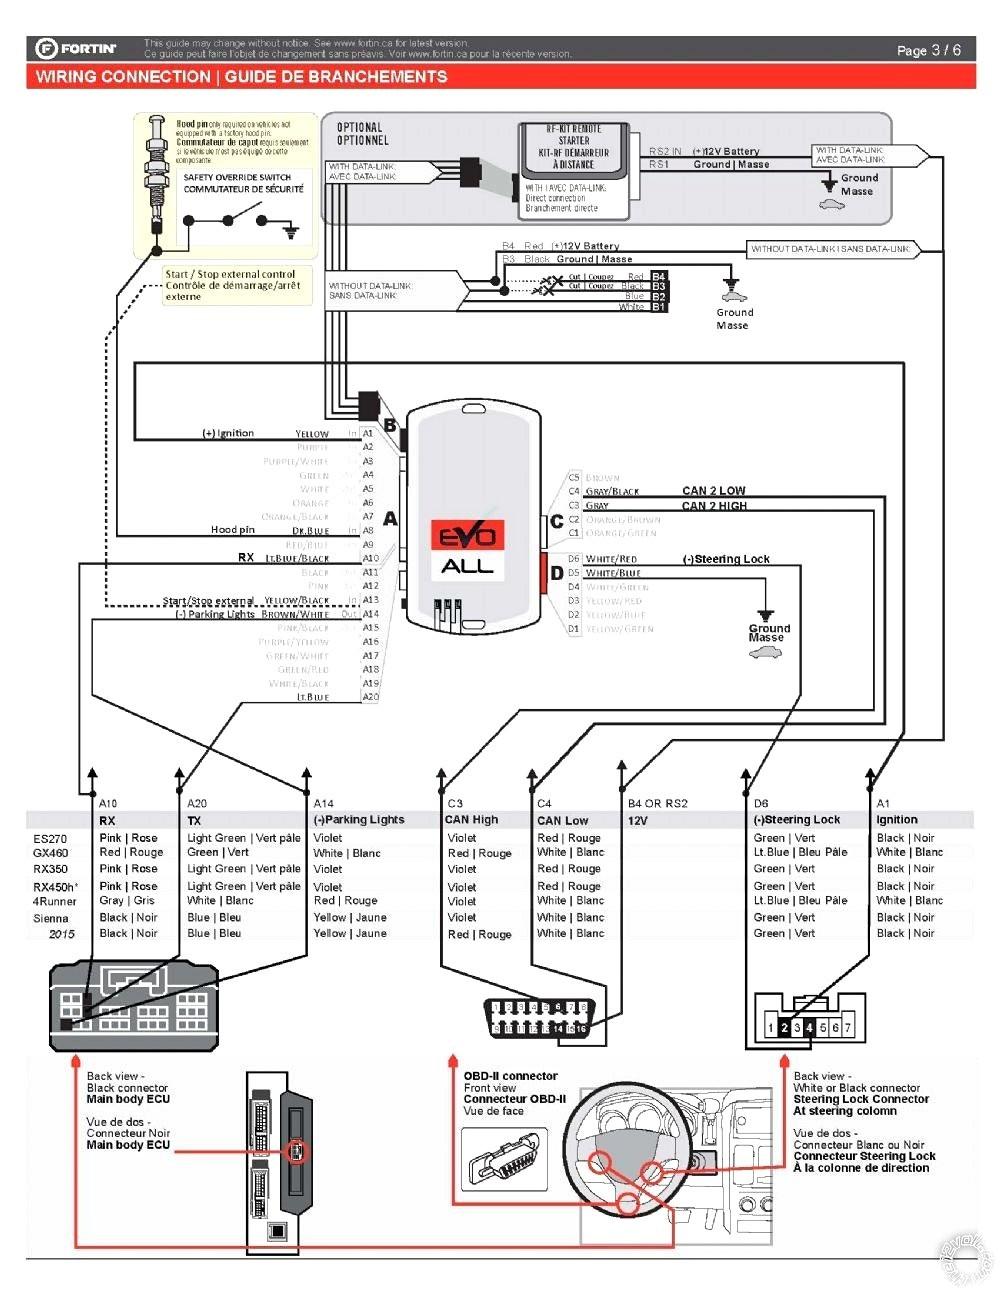 WRG-8908] 12 Volt Wiring Diagram Parking Light on